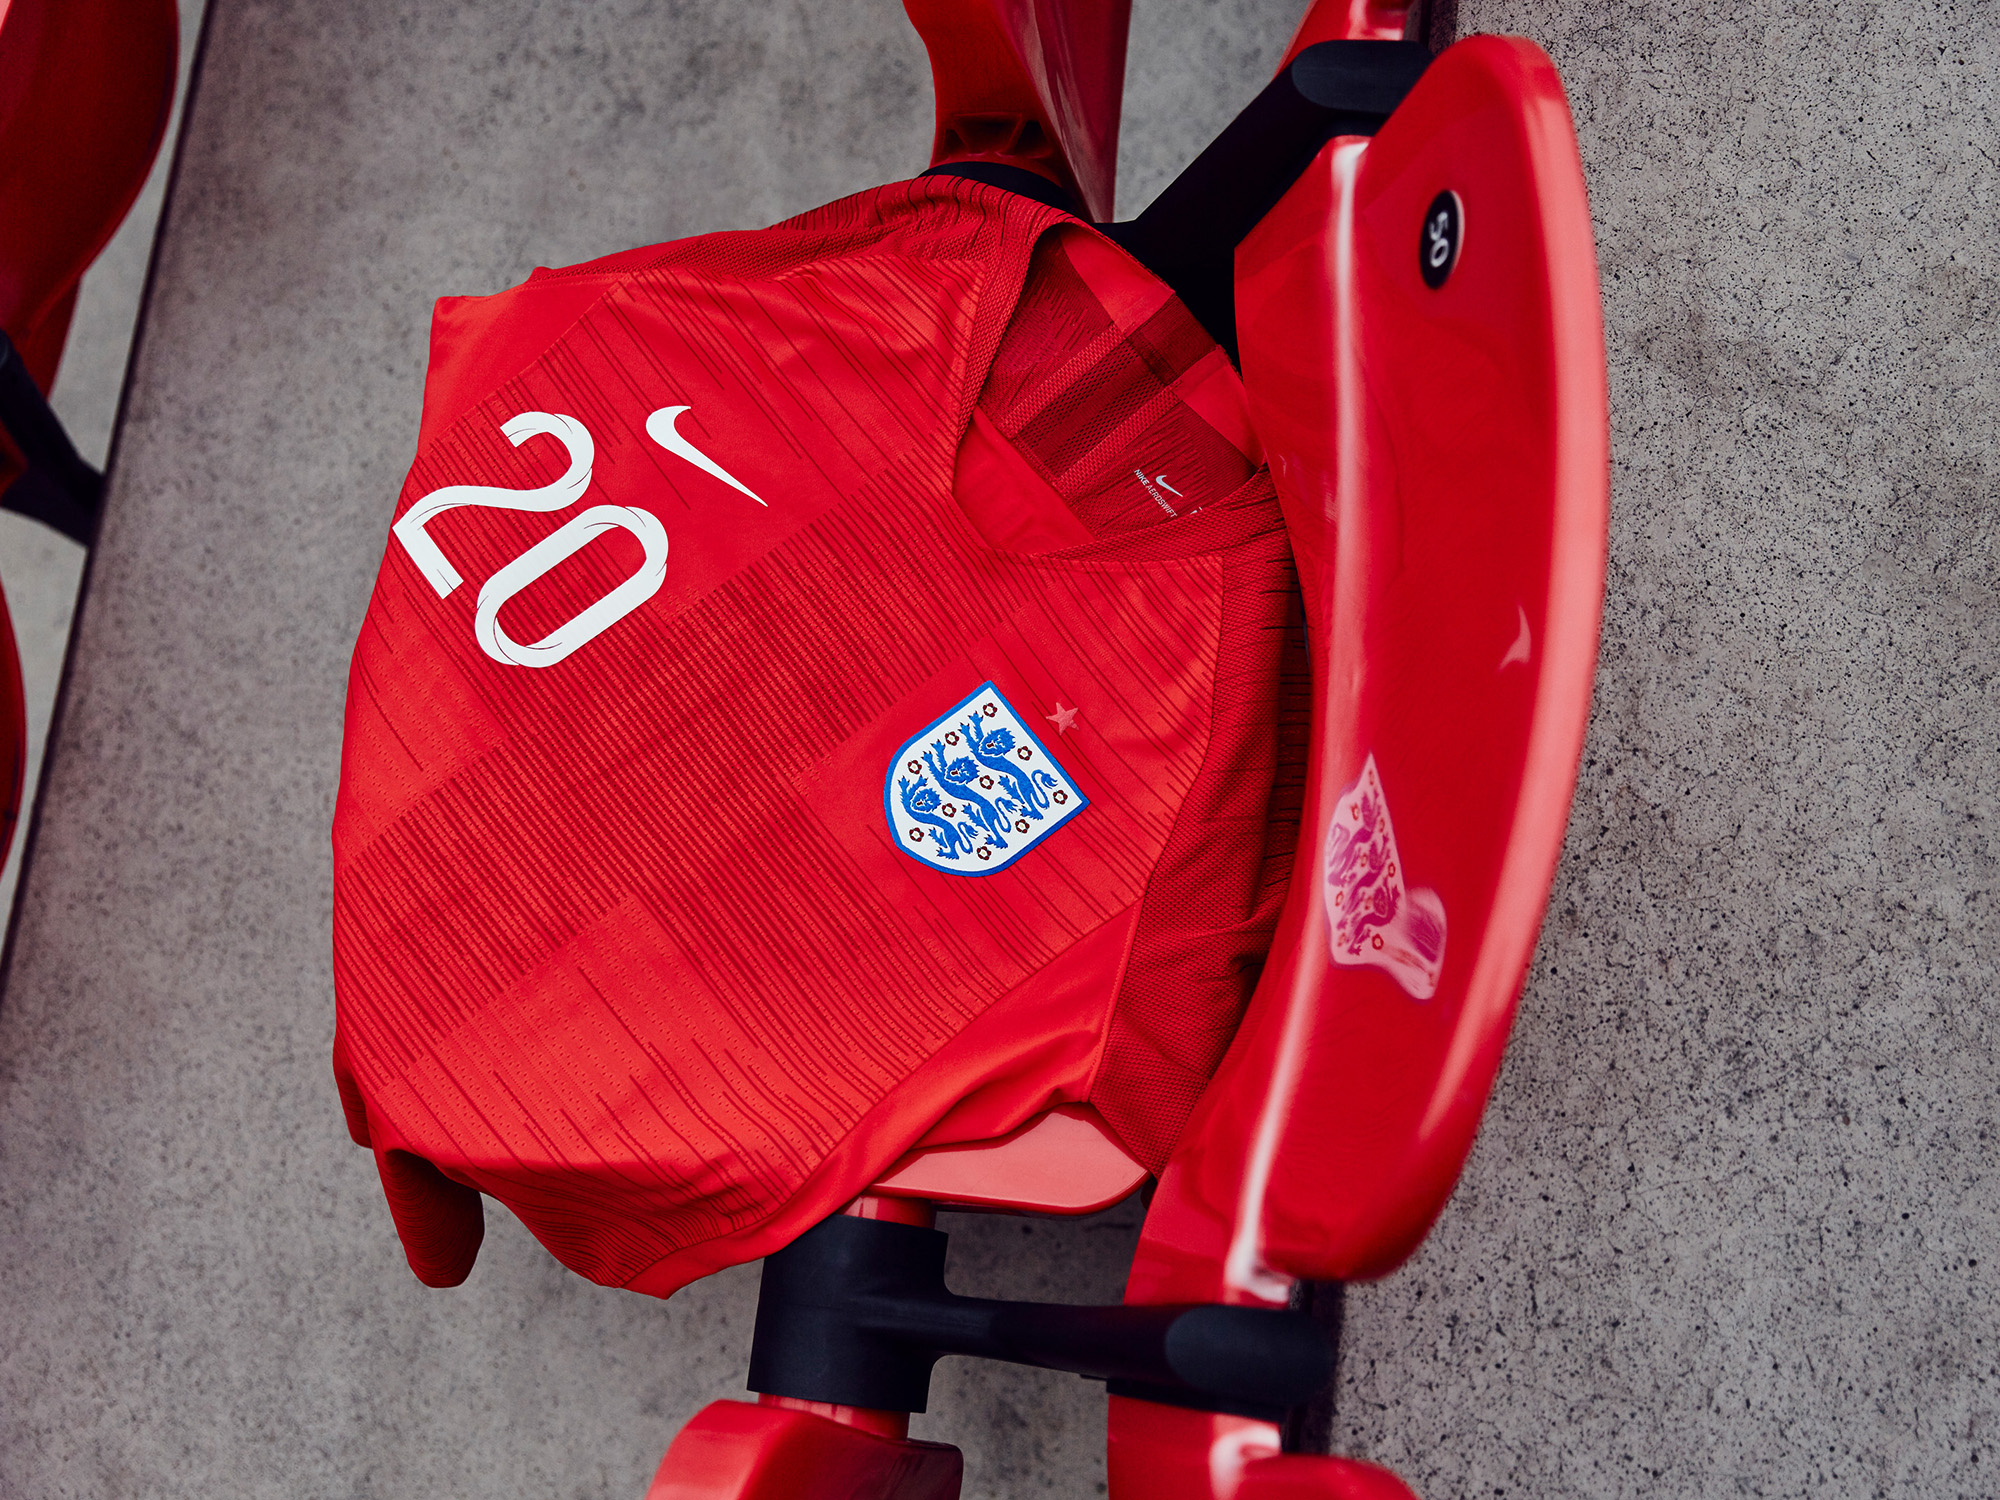 Nike-News-Football-Soccer-England-National-Team-Kit-11_77384